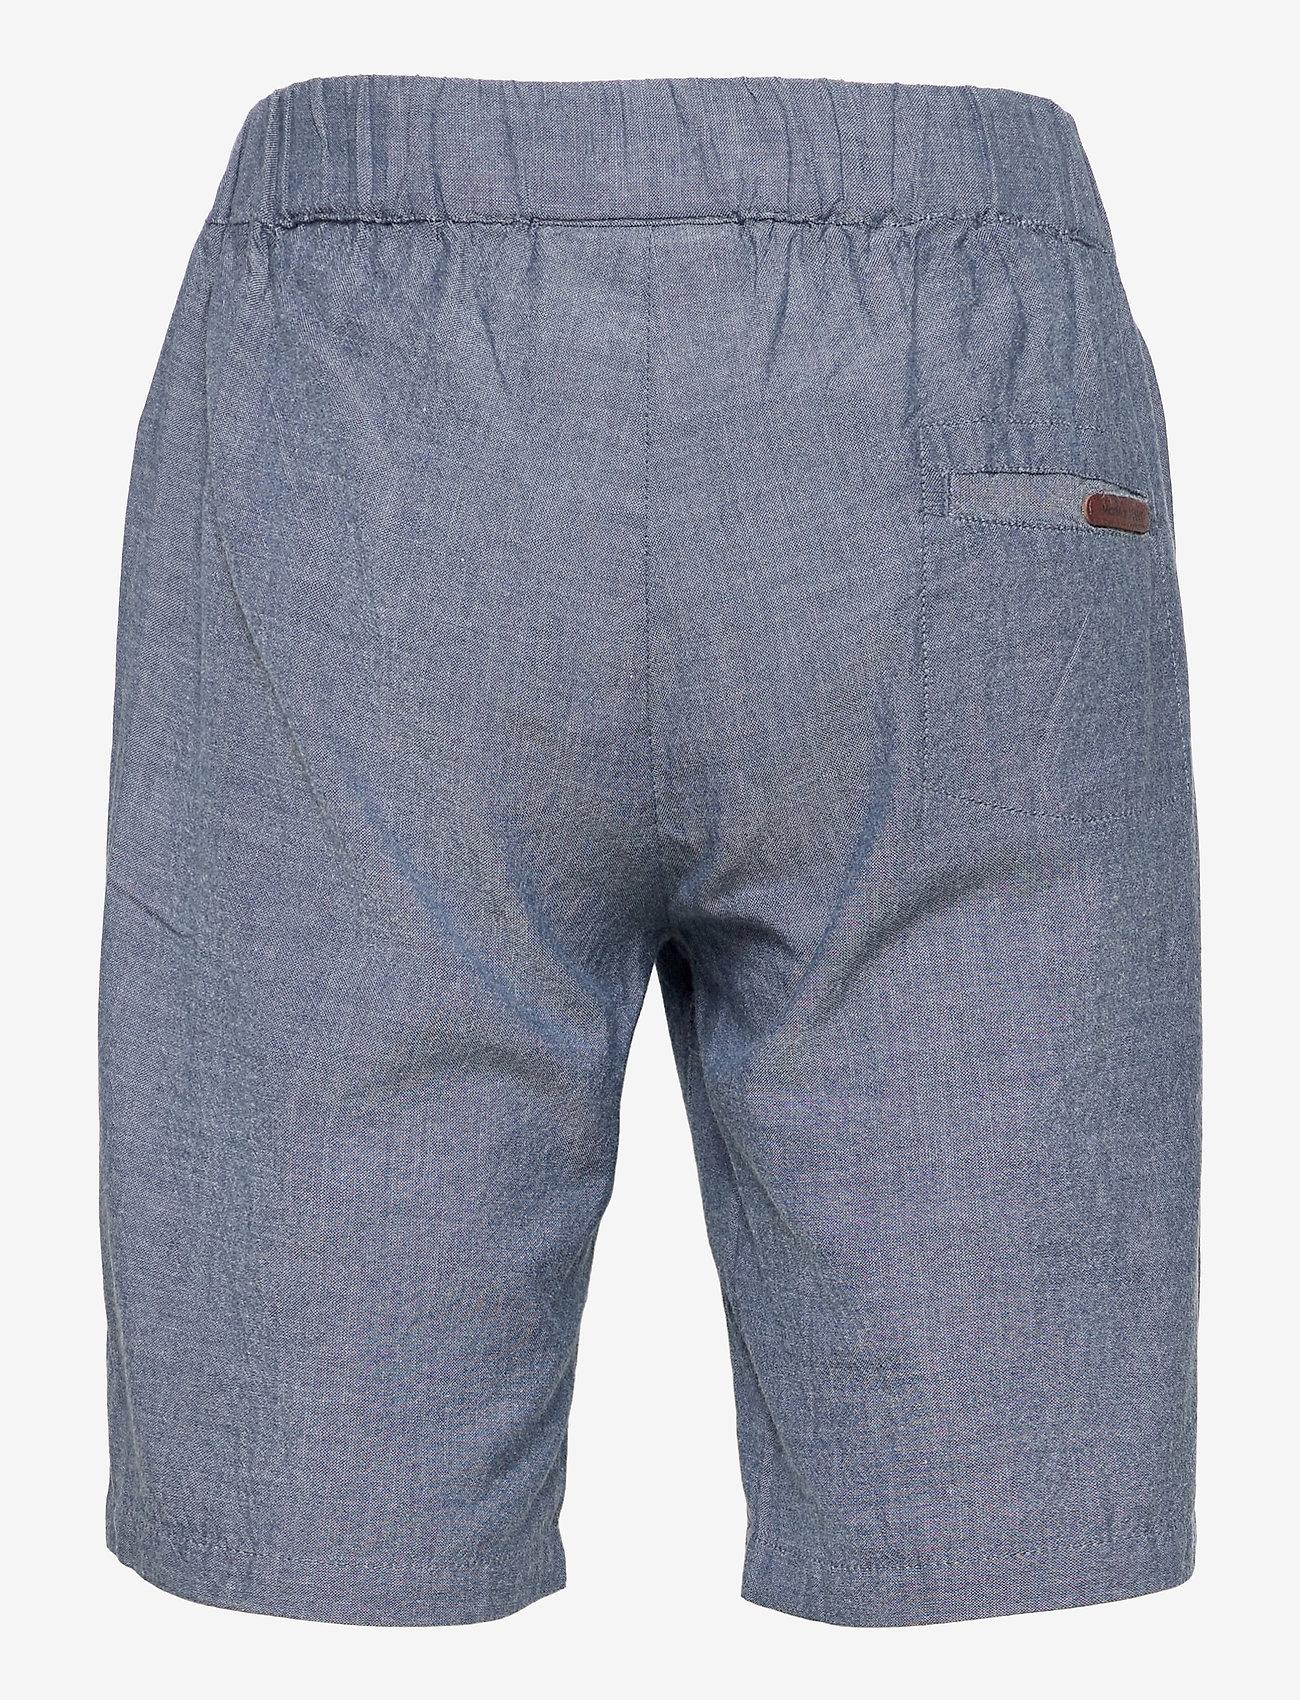 MarMar Cph - Peter - shorts - denim blue - 1